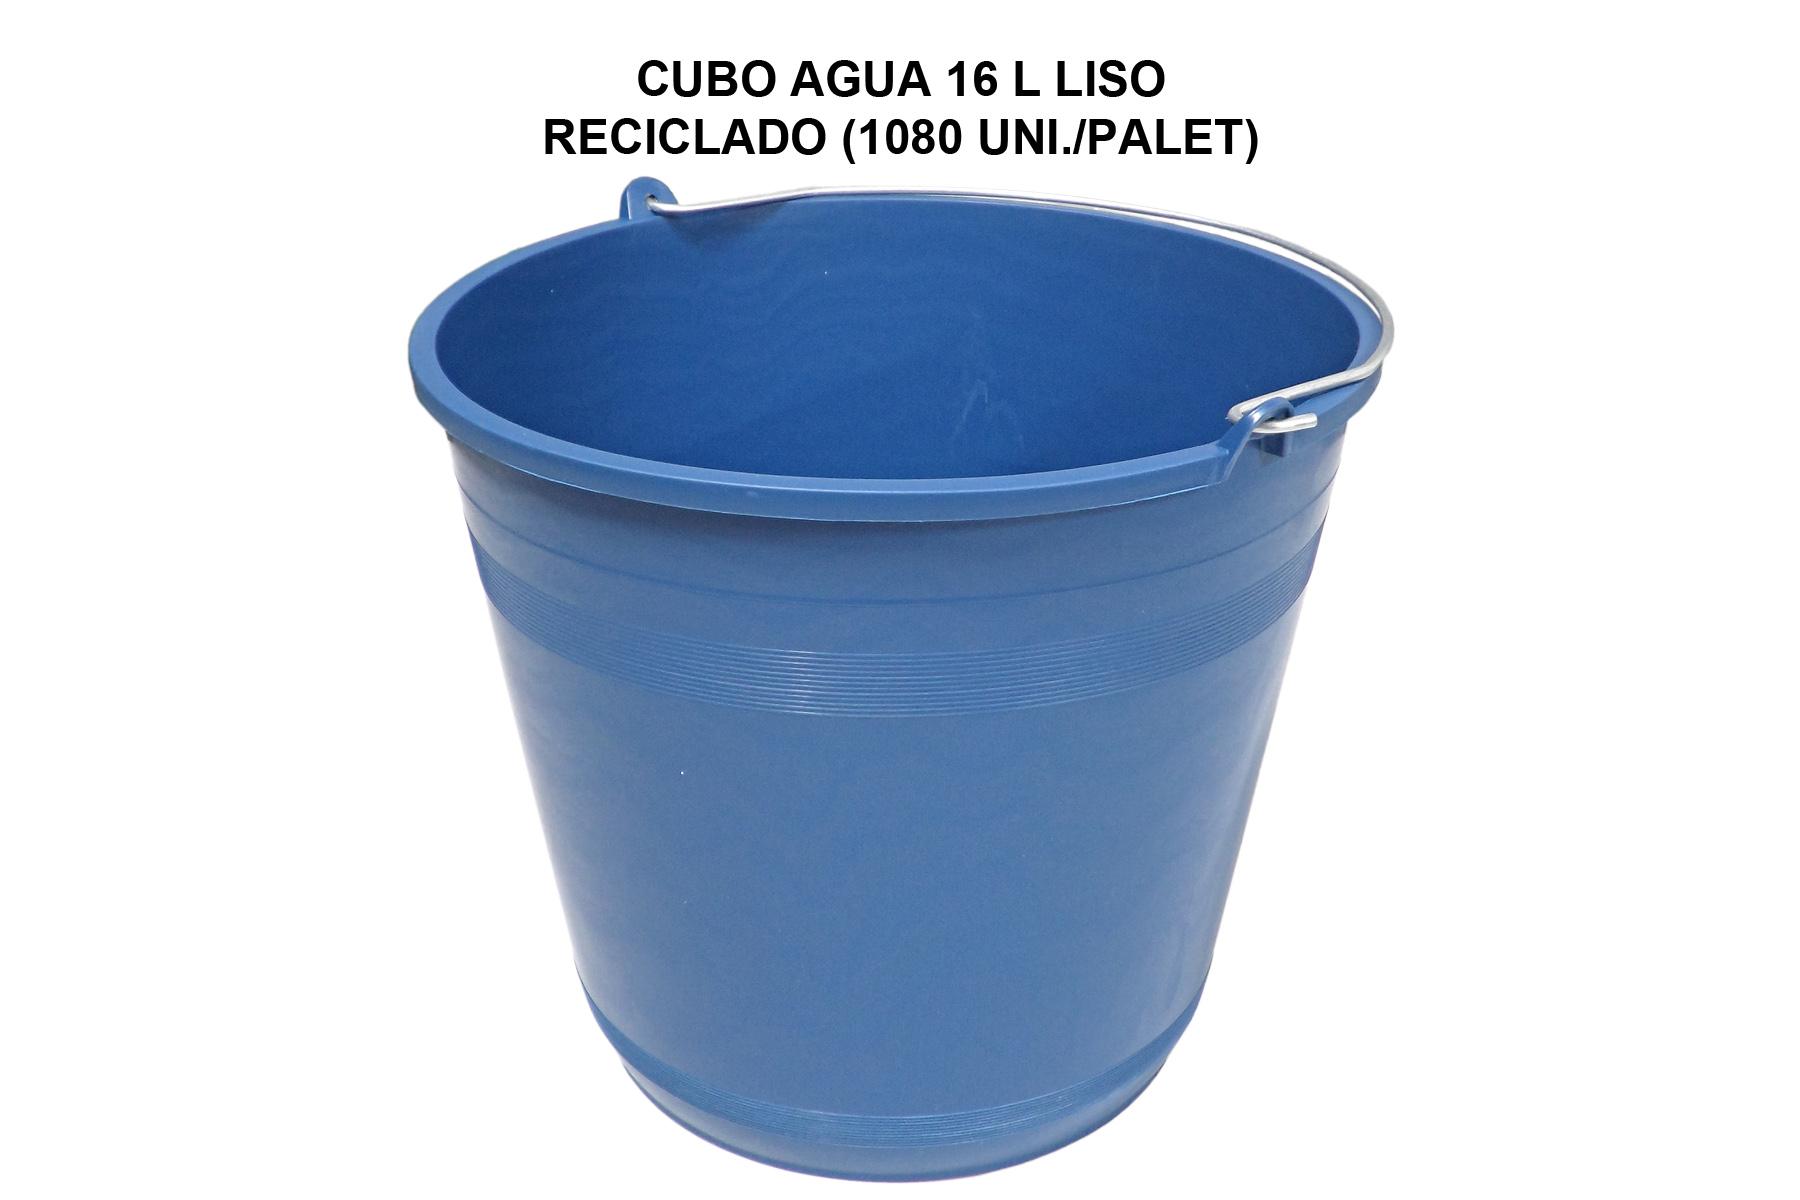 CUBO AGUA 16L LISO RECICLADO